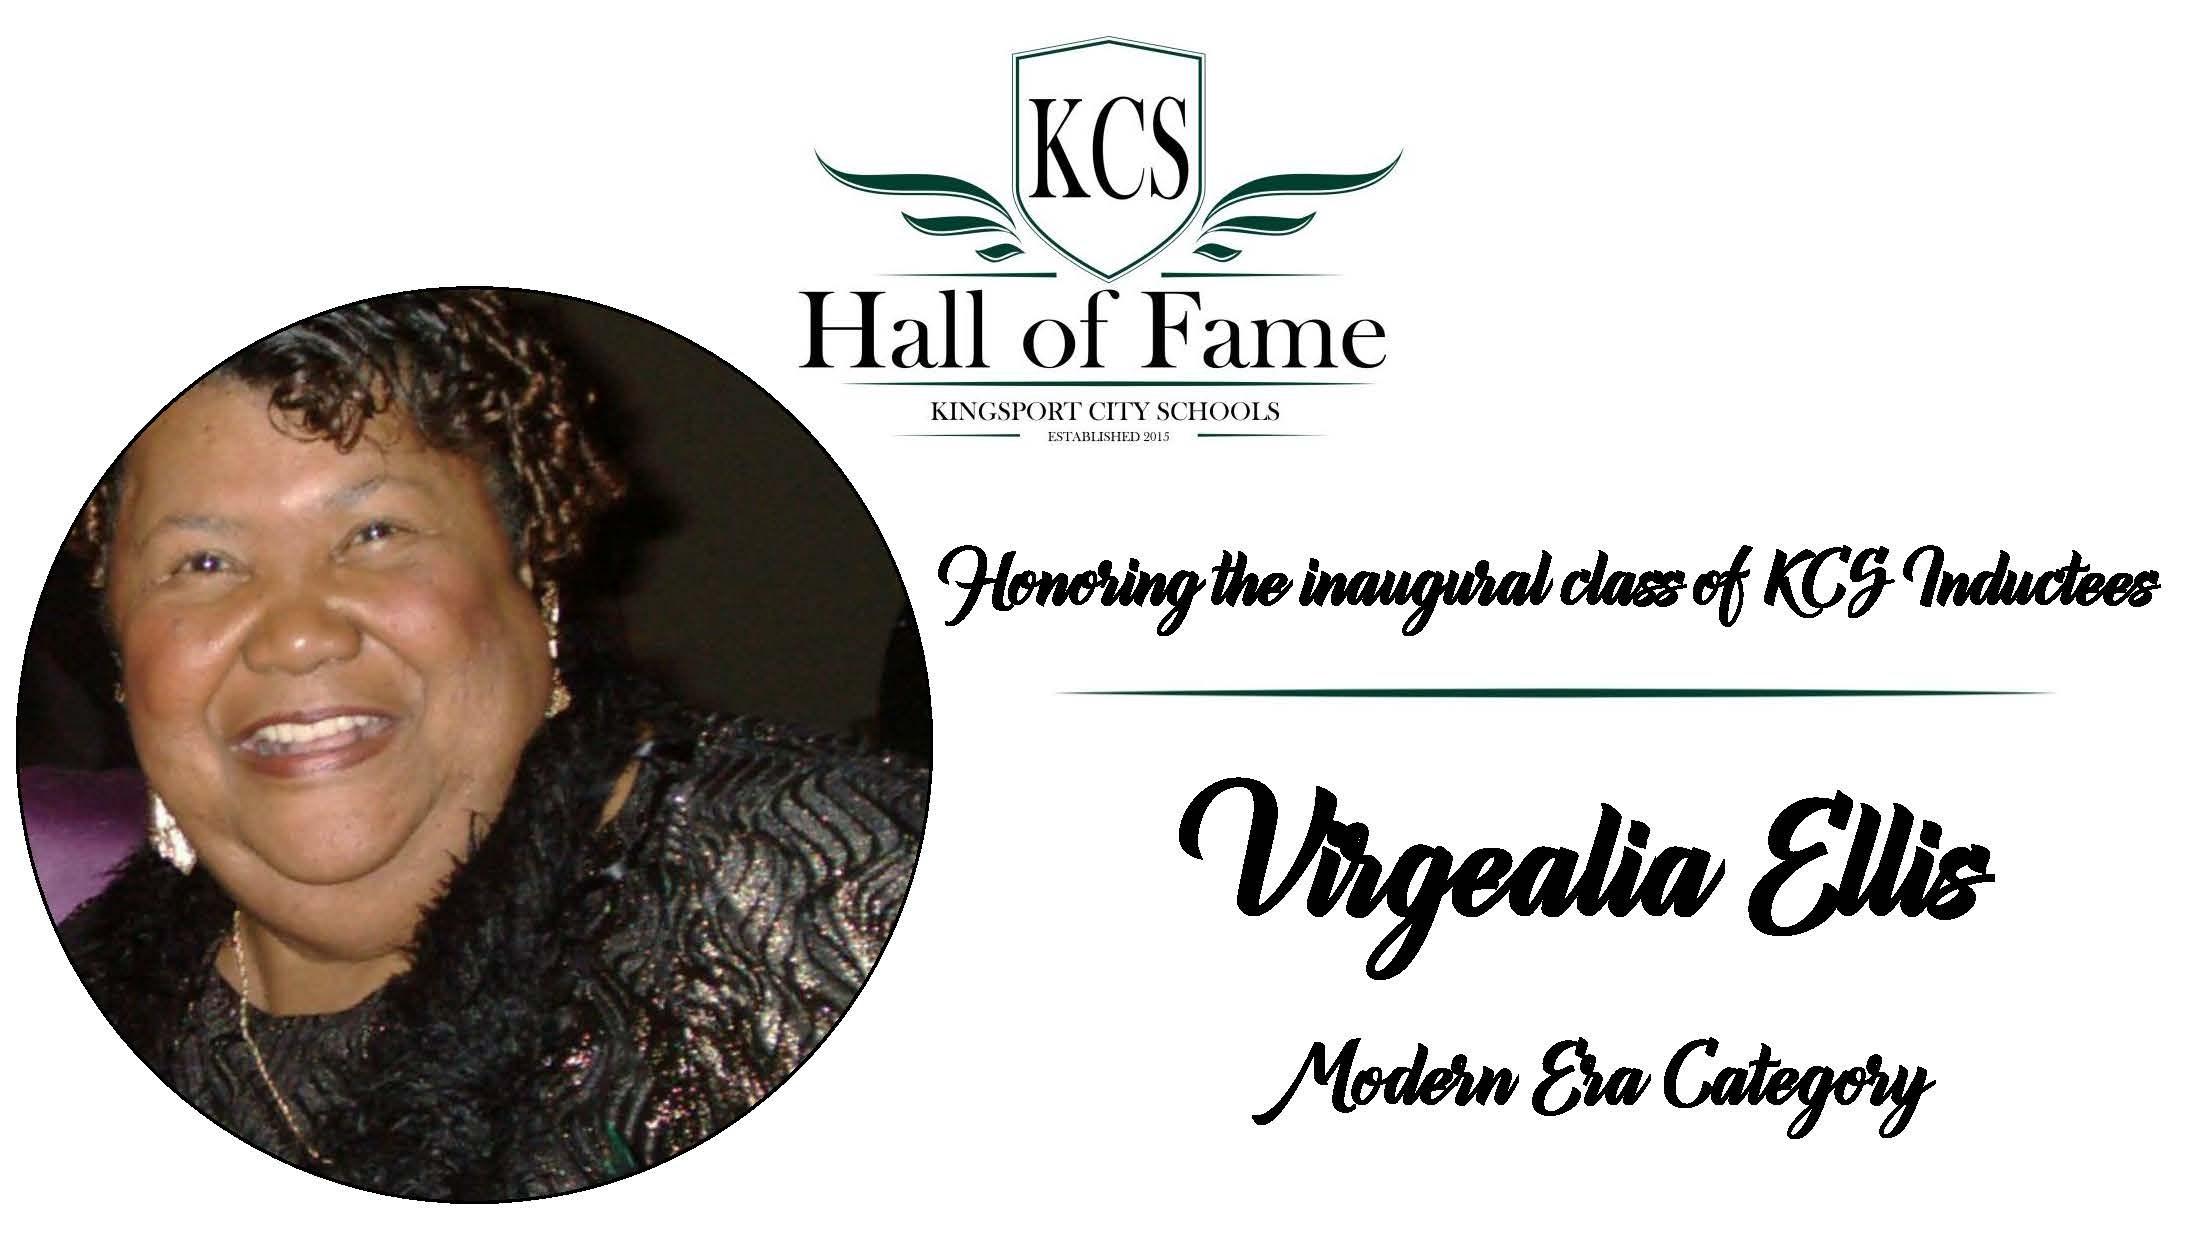 Mrs. Virgealia